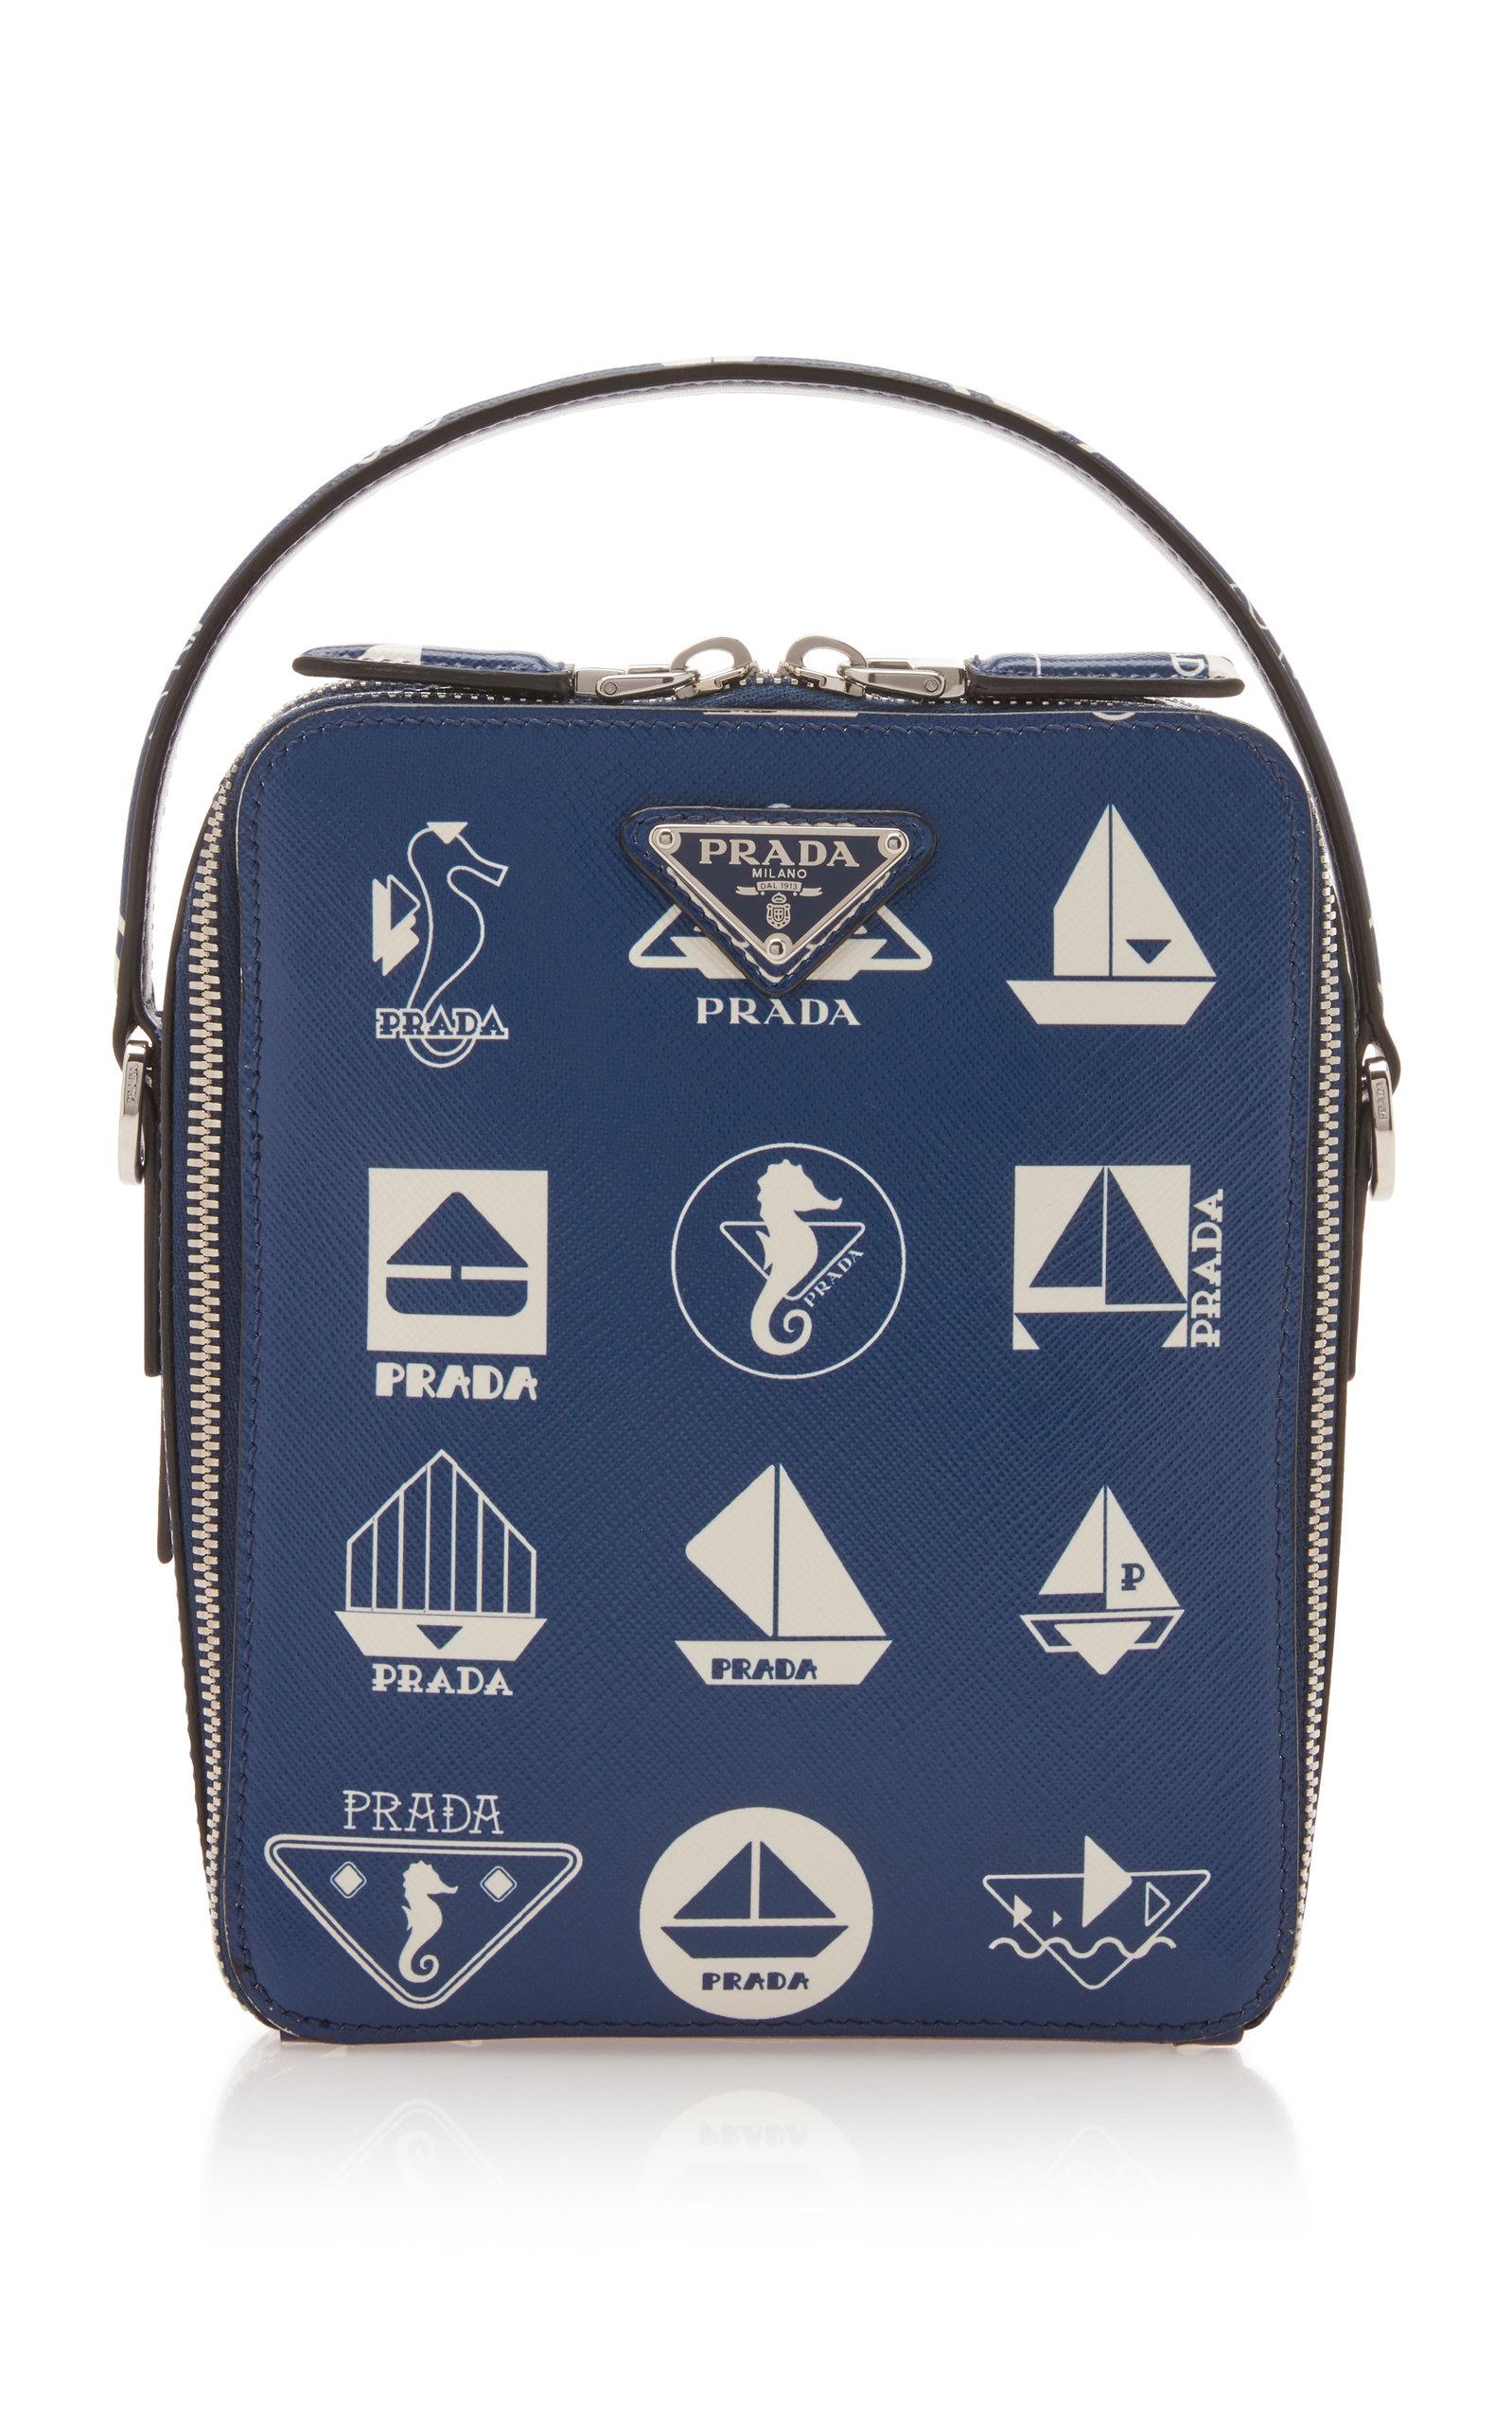 6e370d48ed0d1 PradaNautical Leather Crossbody Bag. CLOSE. Loading